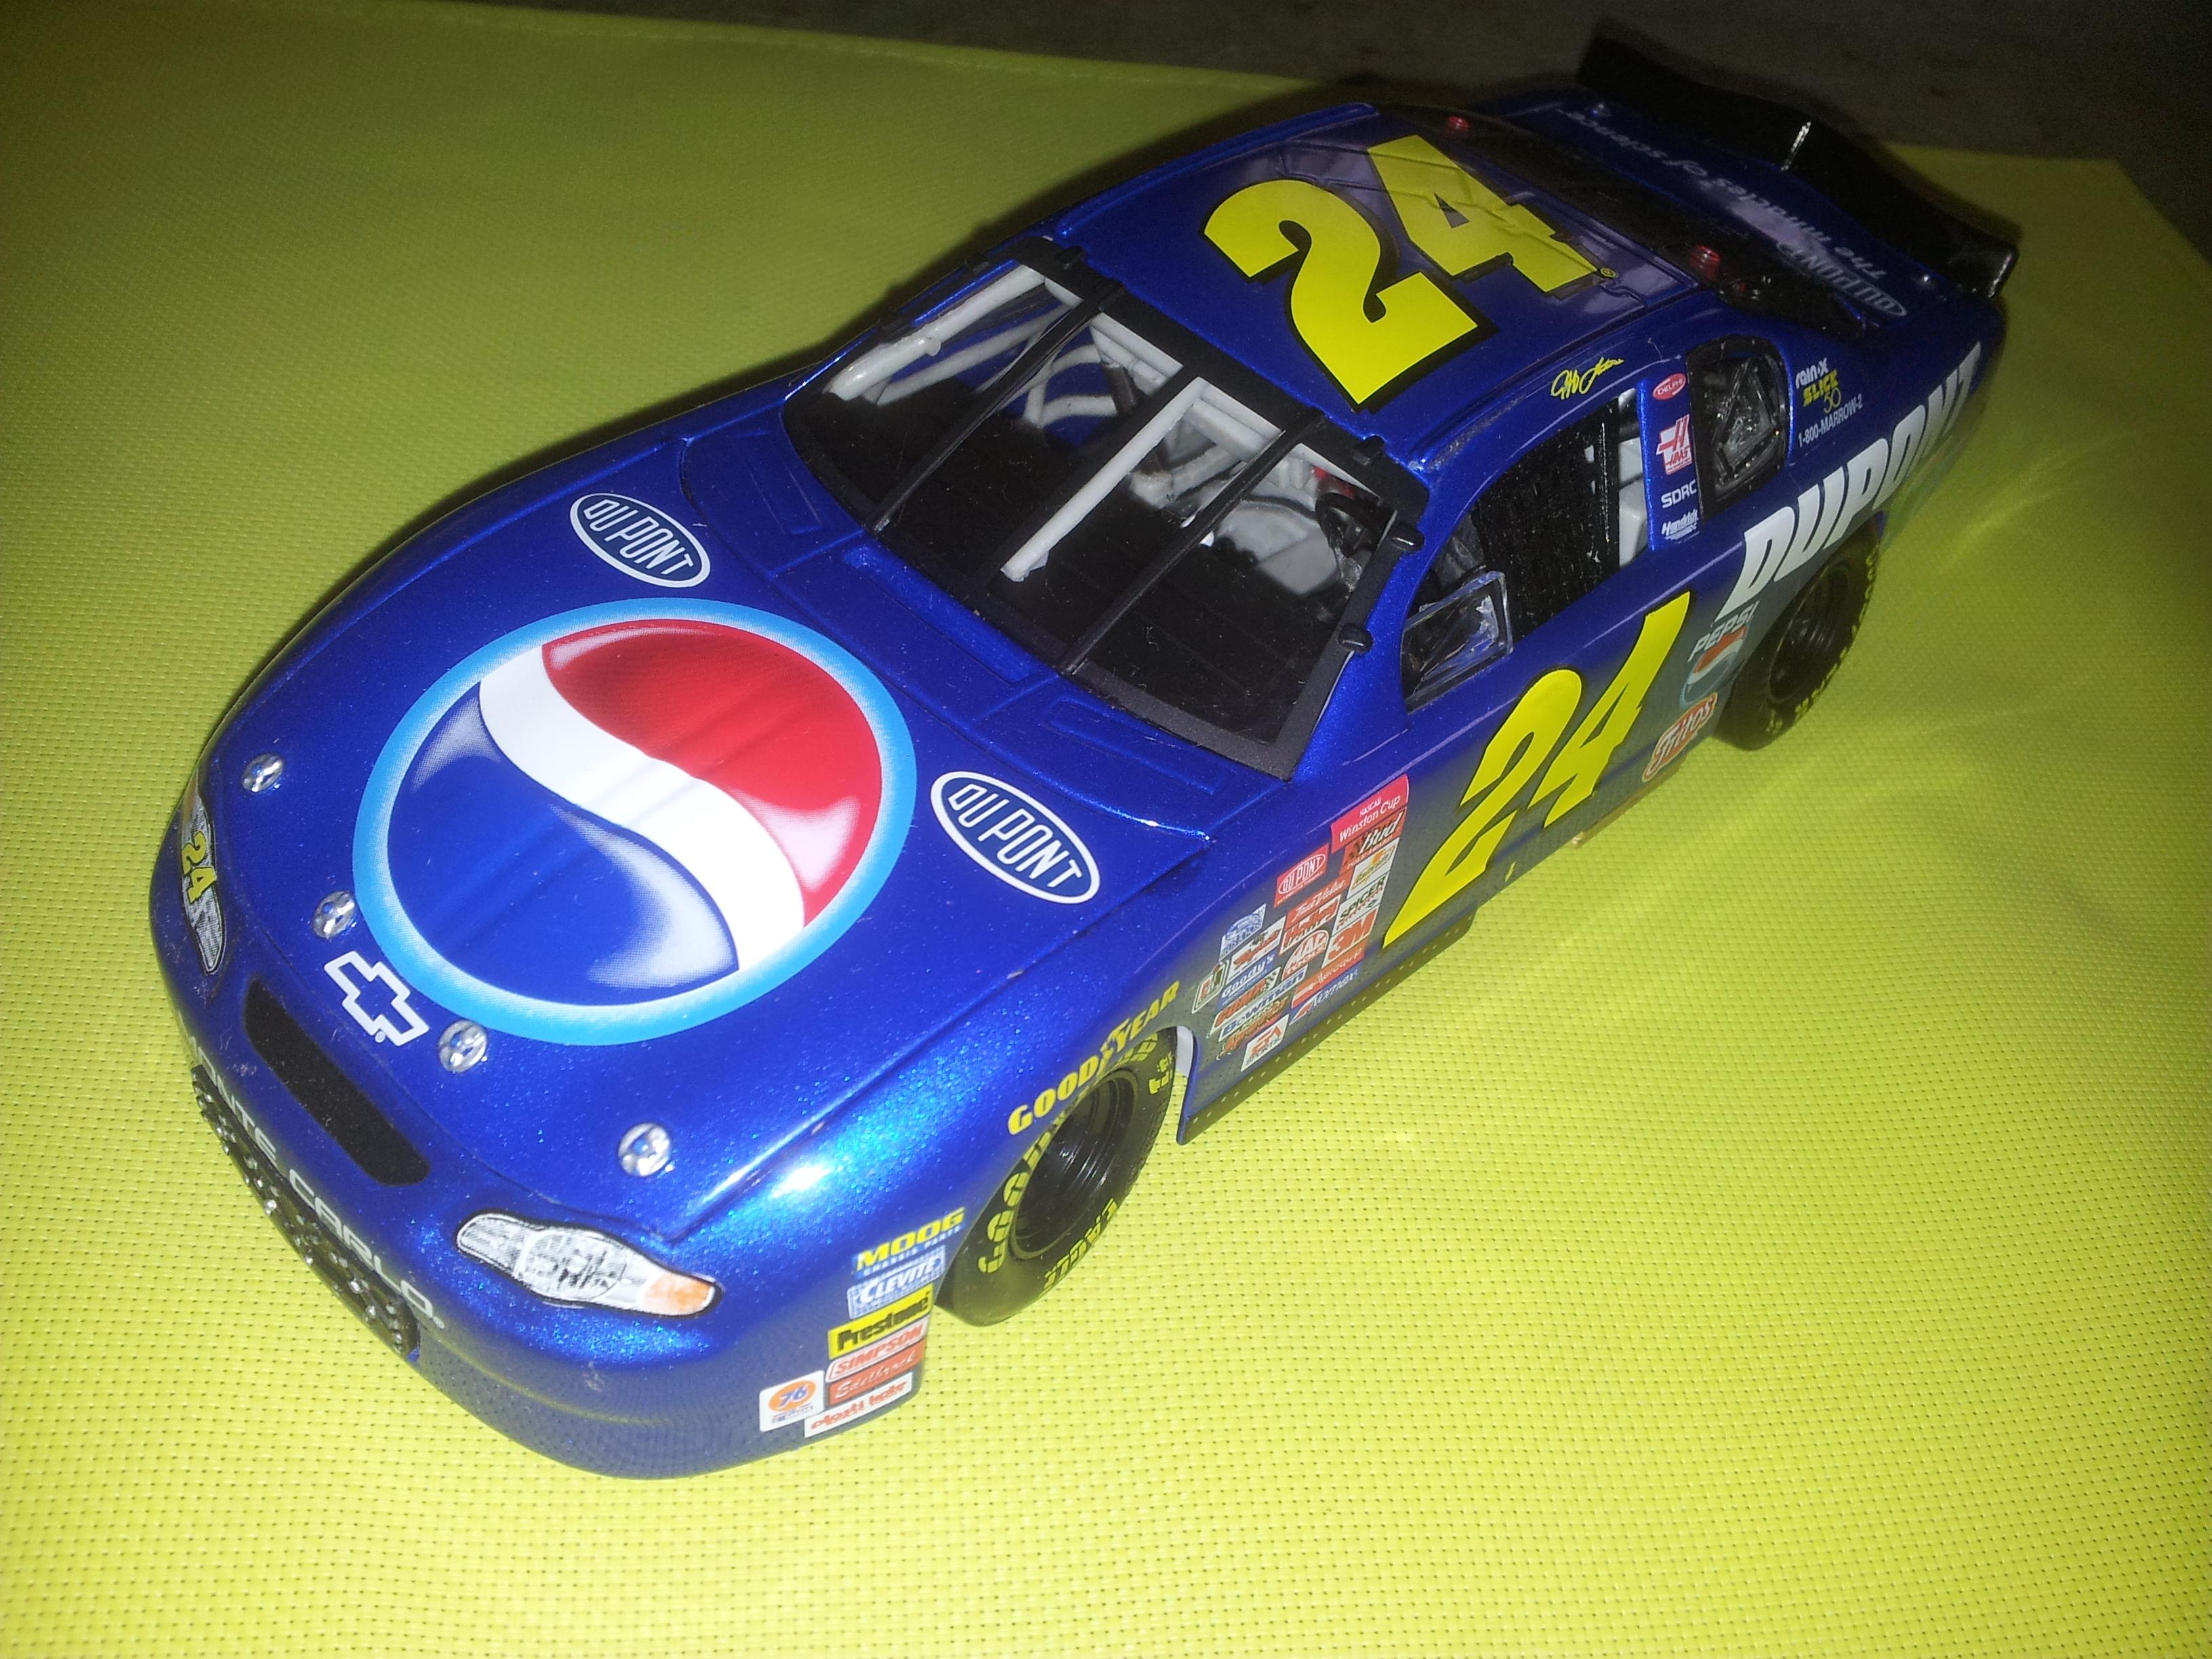 Chevy Monte-Carlo 2002 #24 Jeff Gordon Pepsi 717686C2000247